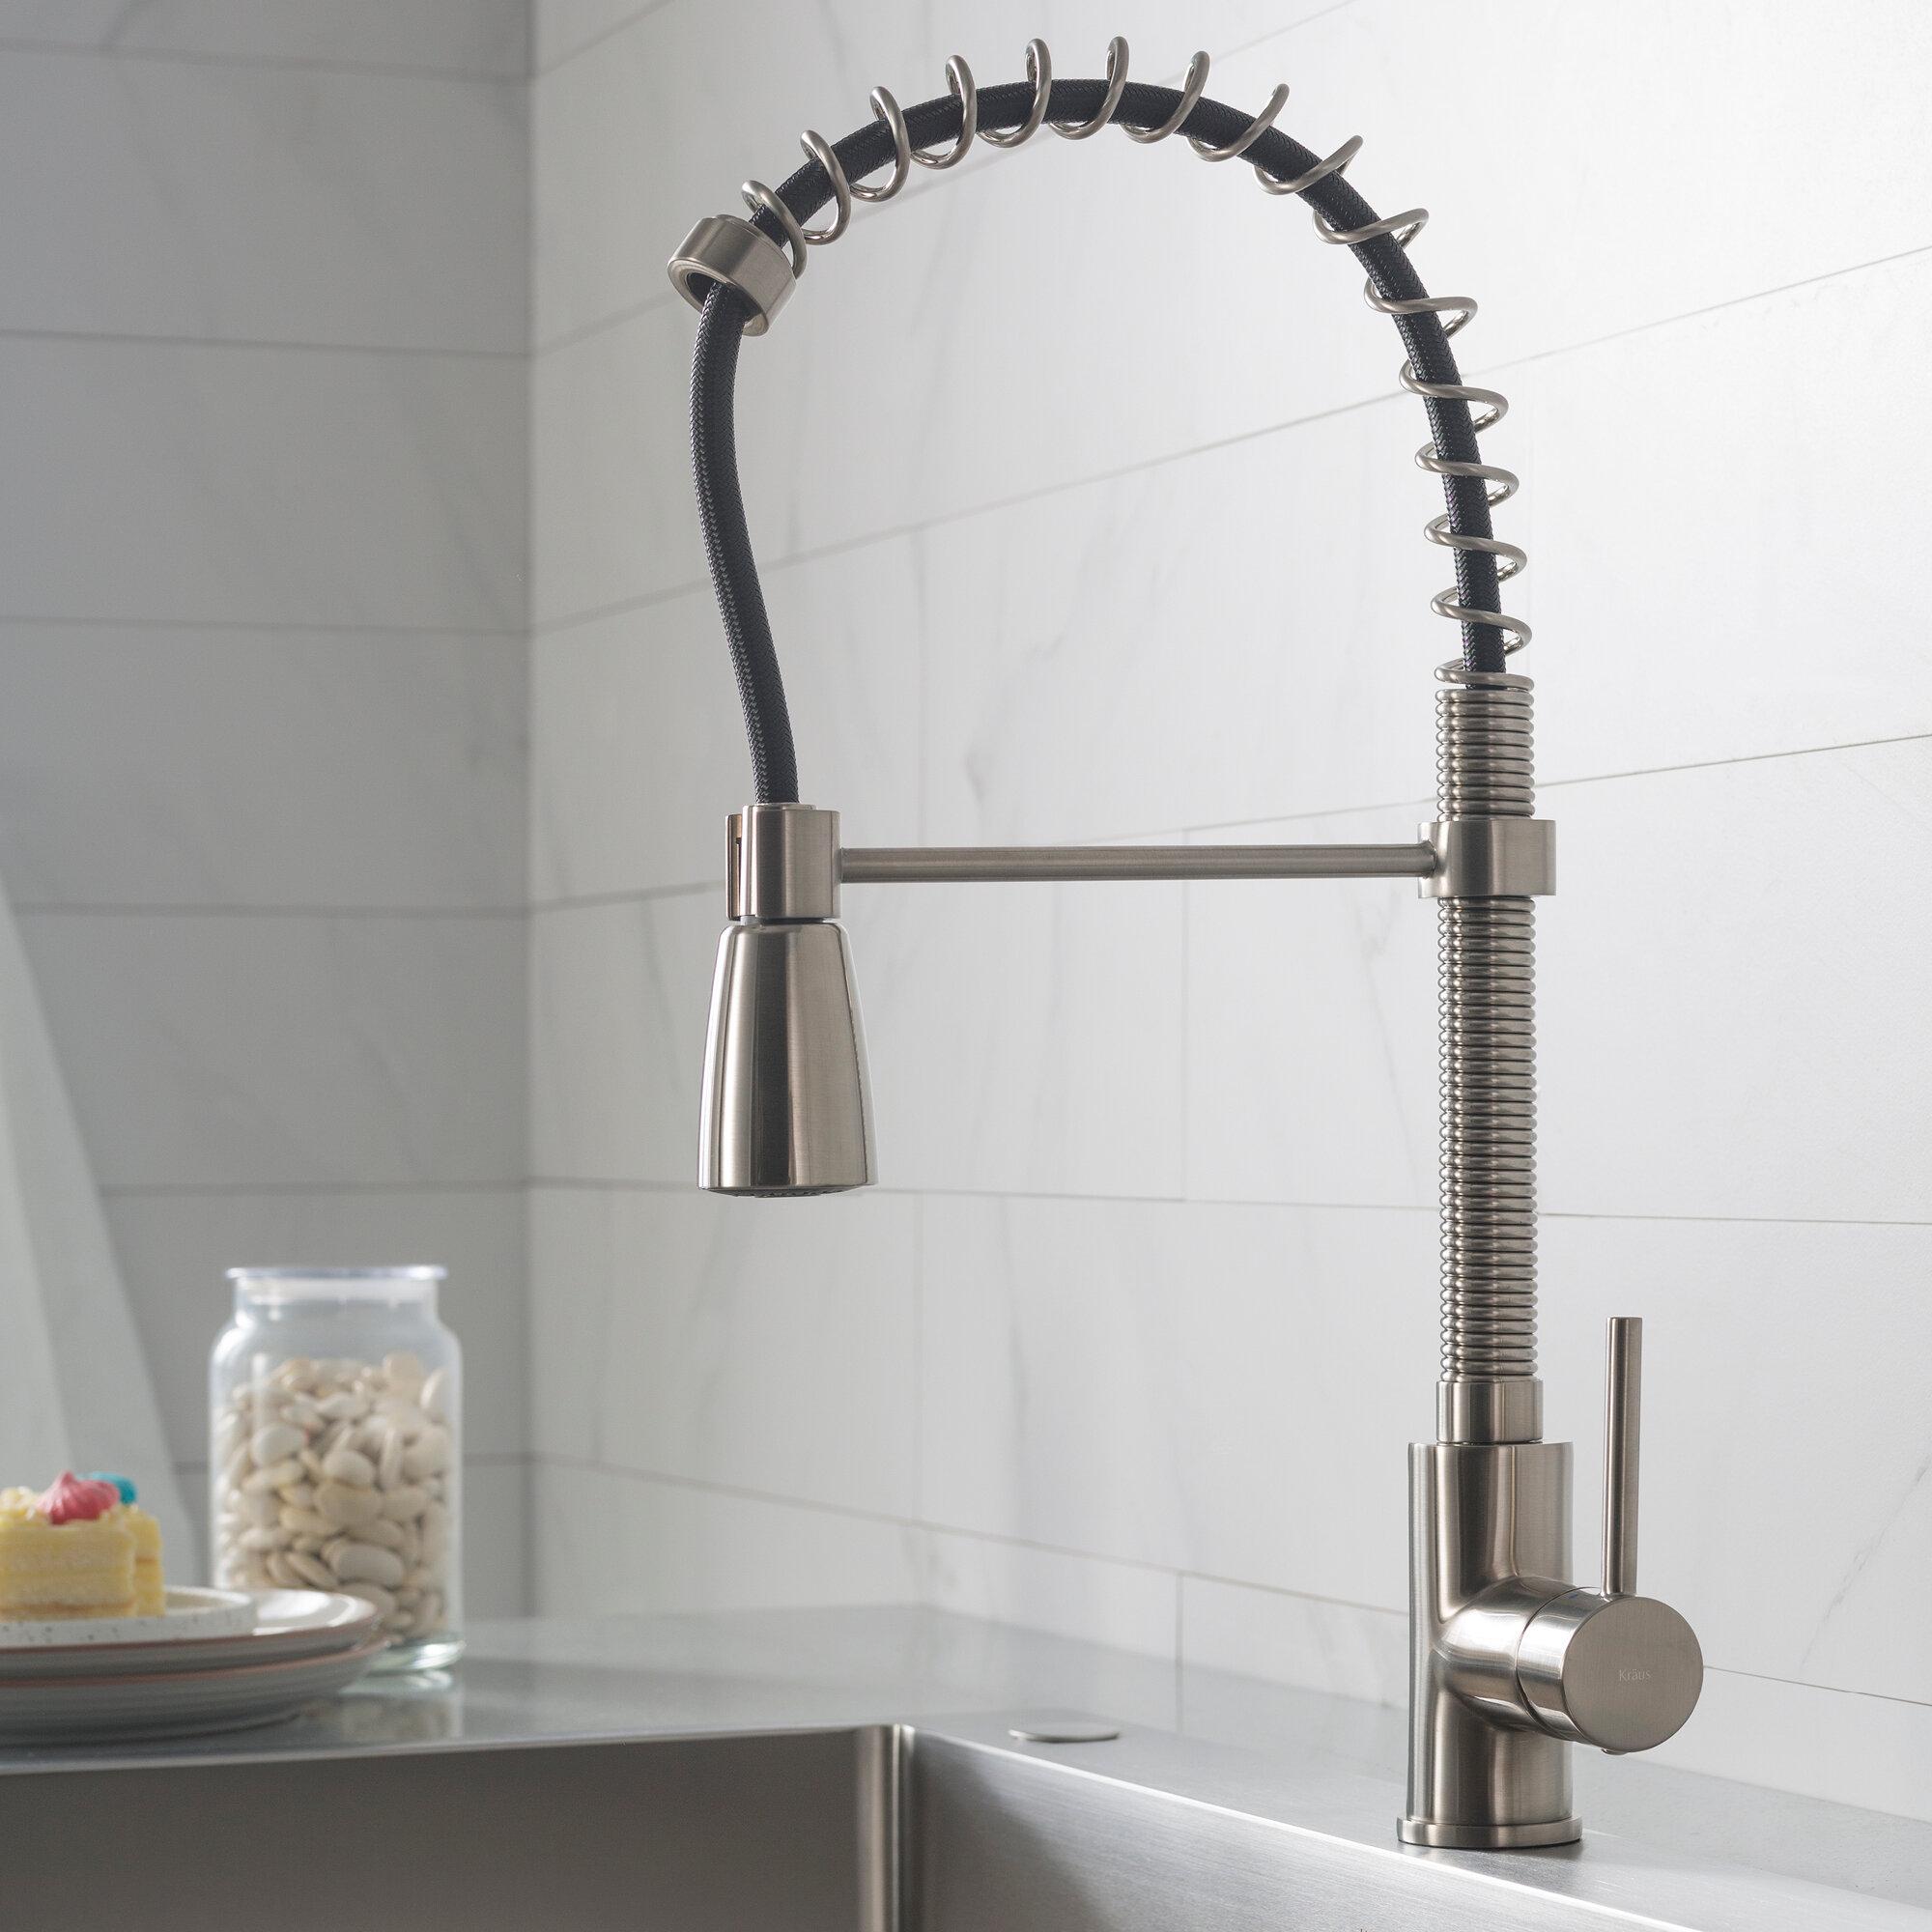 Kpf 1612ss Kraus Pull Down Single Handle Kitchen Faucet Reviews Wayfair